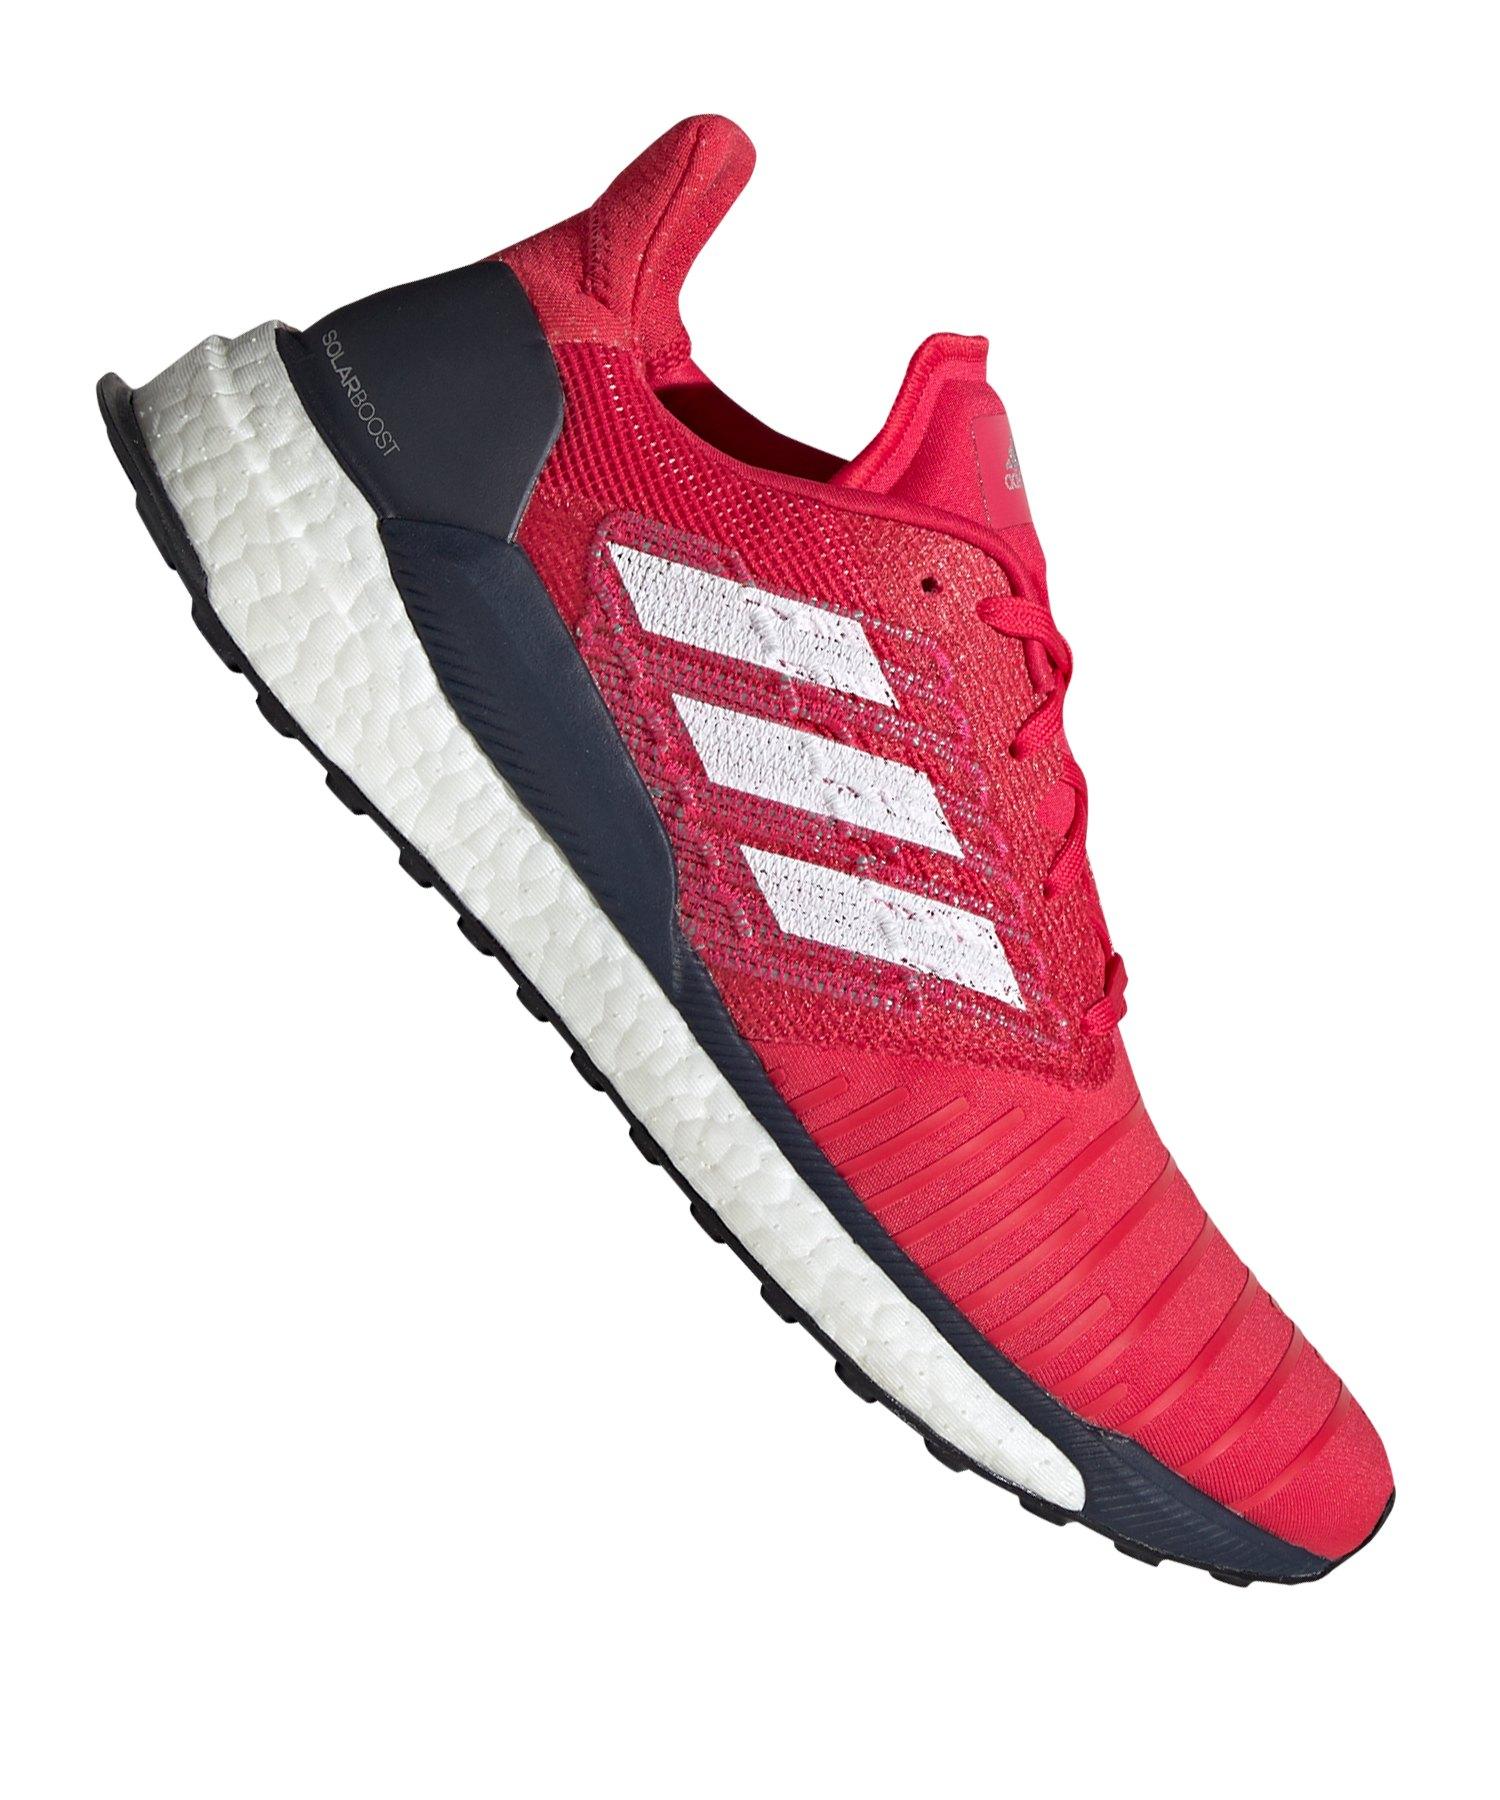 Pink Running Solar Weiss Adidas Ljcfk1u3t5 Boost J35u1cFTlK